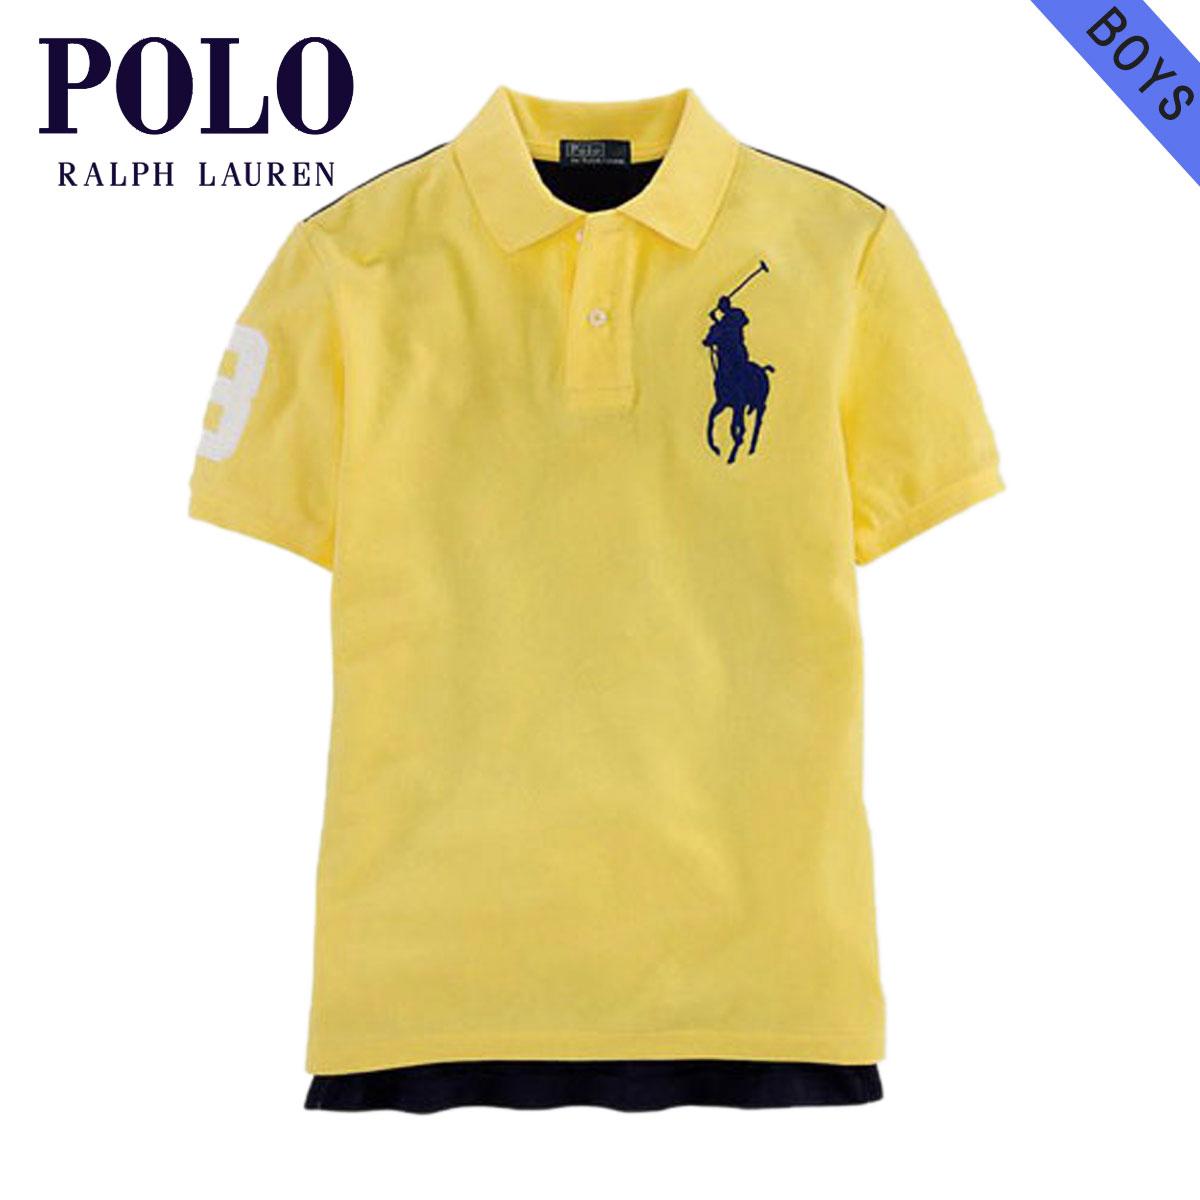 192c4d44837f Poloralflorenkids POLO RALPH LAUREN CHILDREN genuine kids clothing boys Polo  Shirt Big Pony Mesh Polo  18121236 YELLOW 10P22Jul14